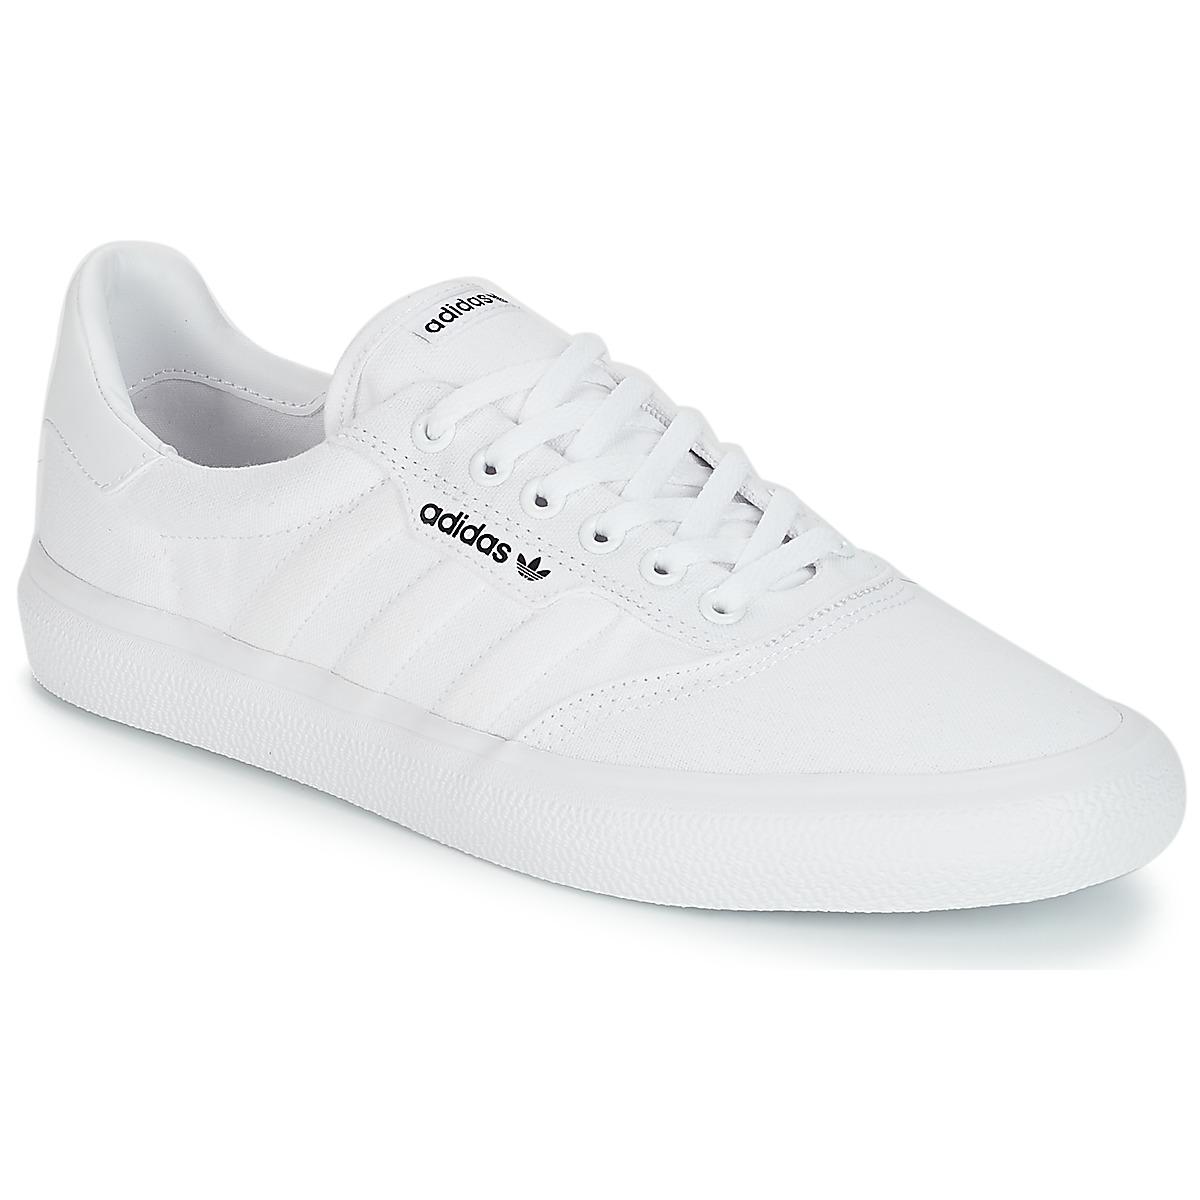 adidas Originals 3MC Weiss - Kostenloser Versand bei Spartoode ! - Schuhe Sneaker Low  64,95 €